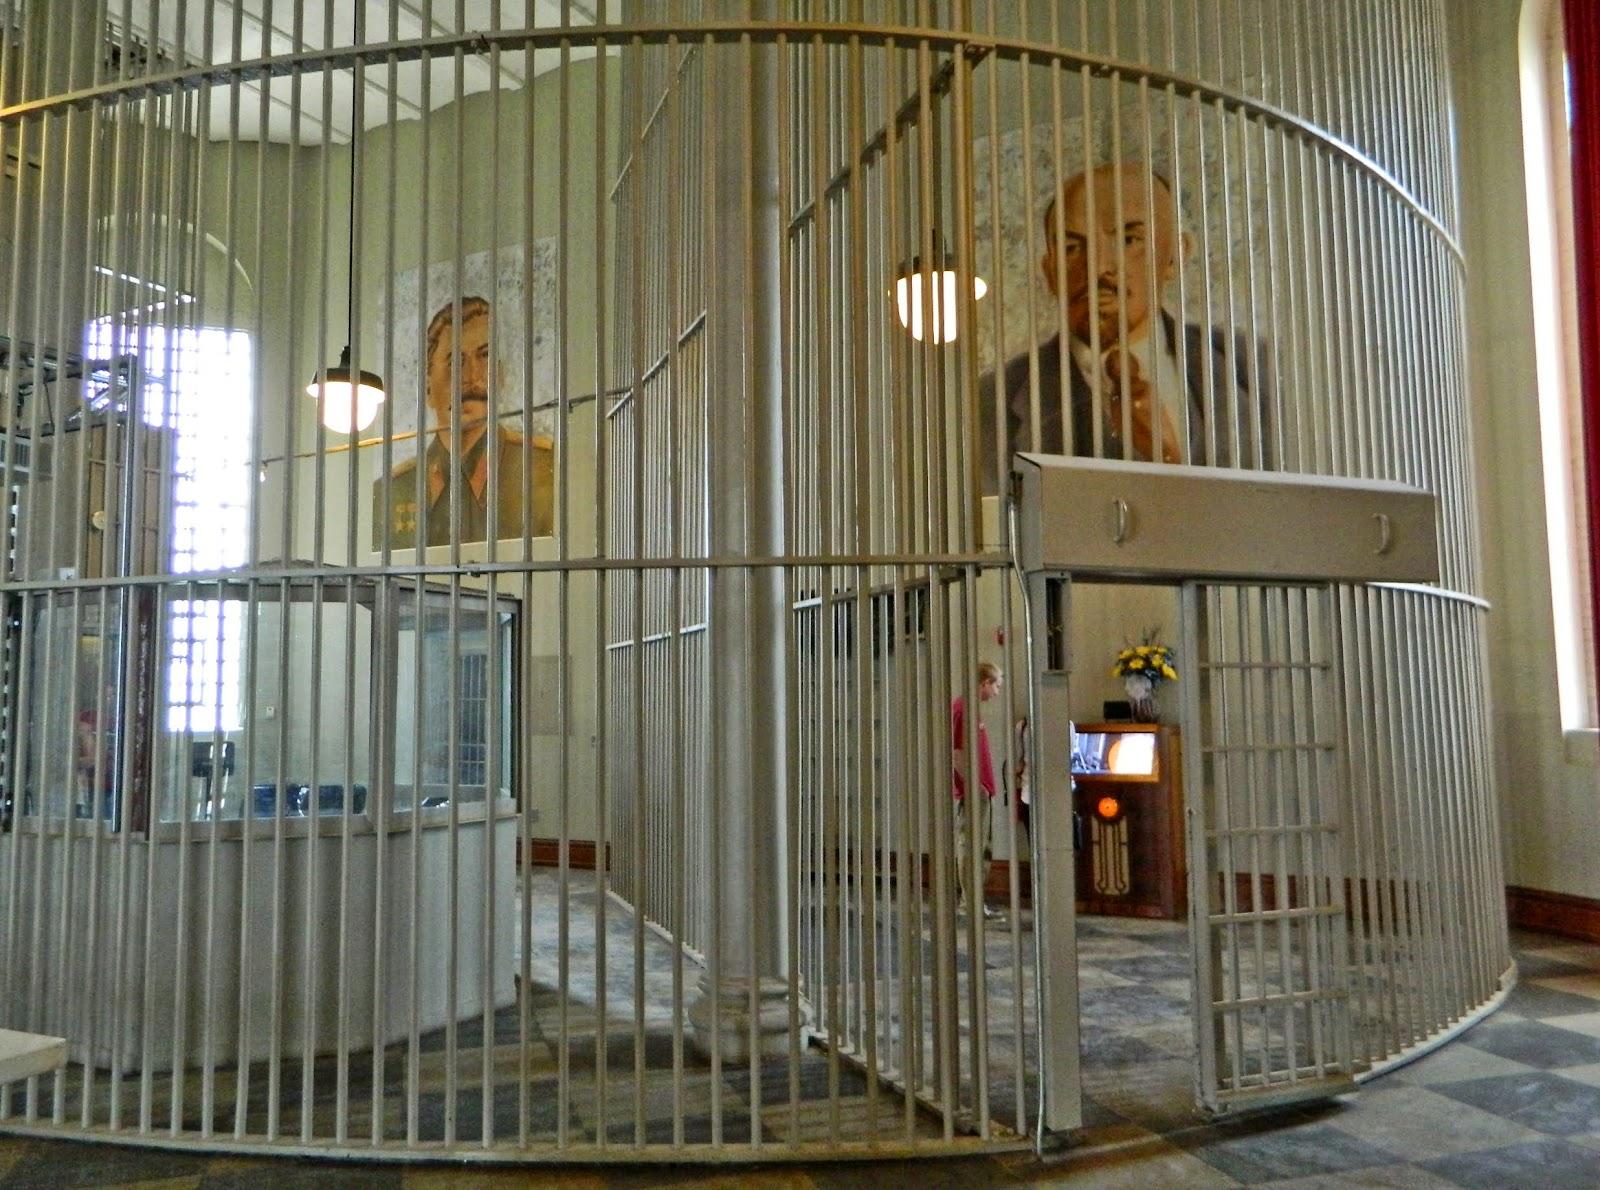 Jax Stumpes Ohio State Reformatory 5 2 2015